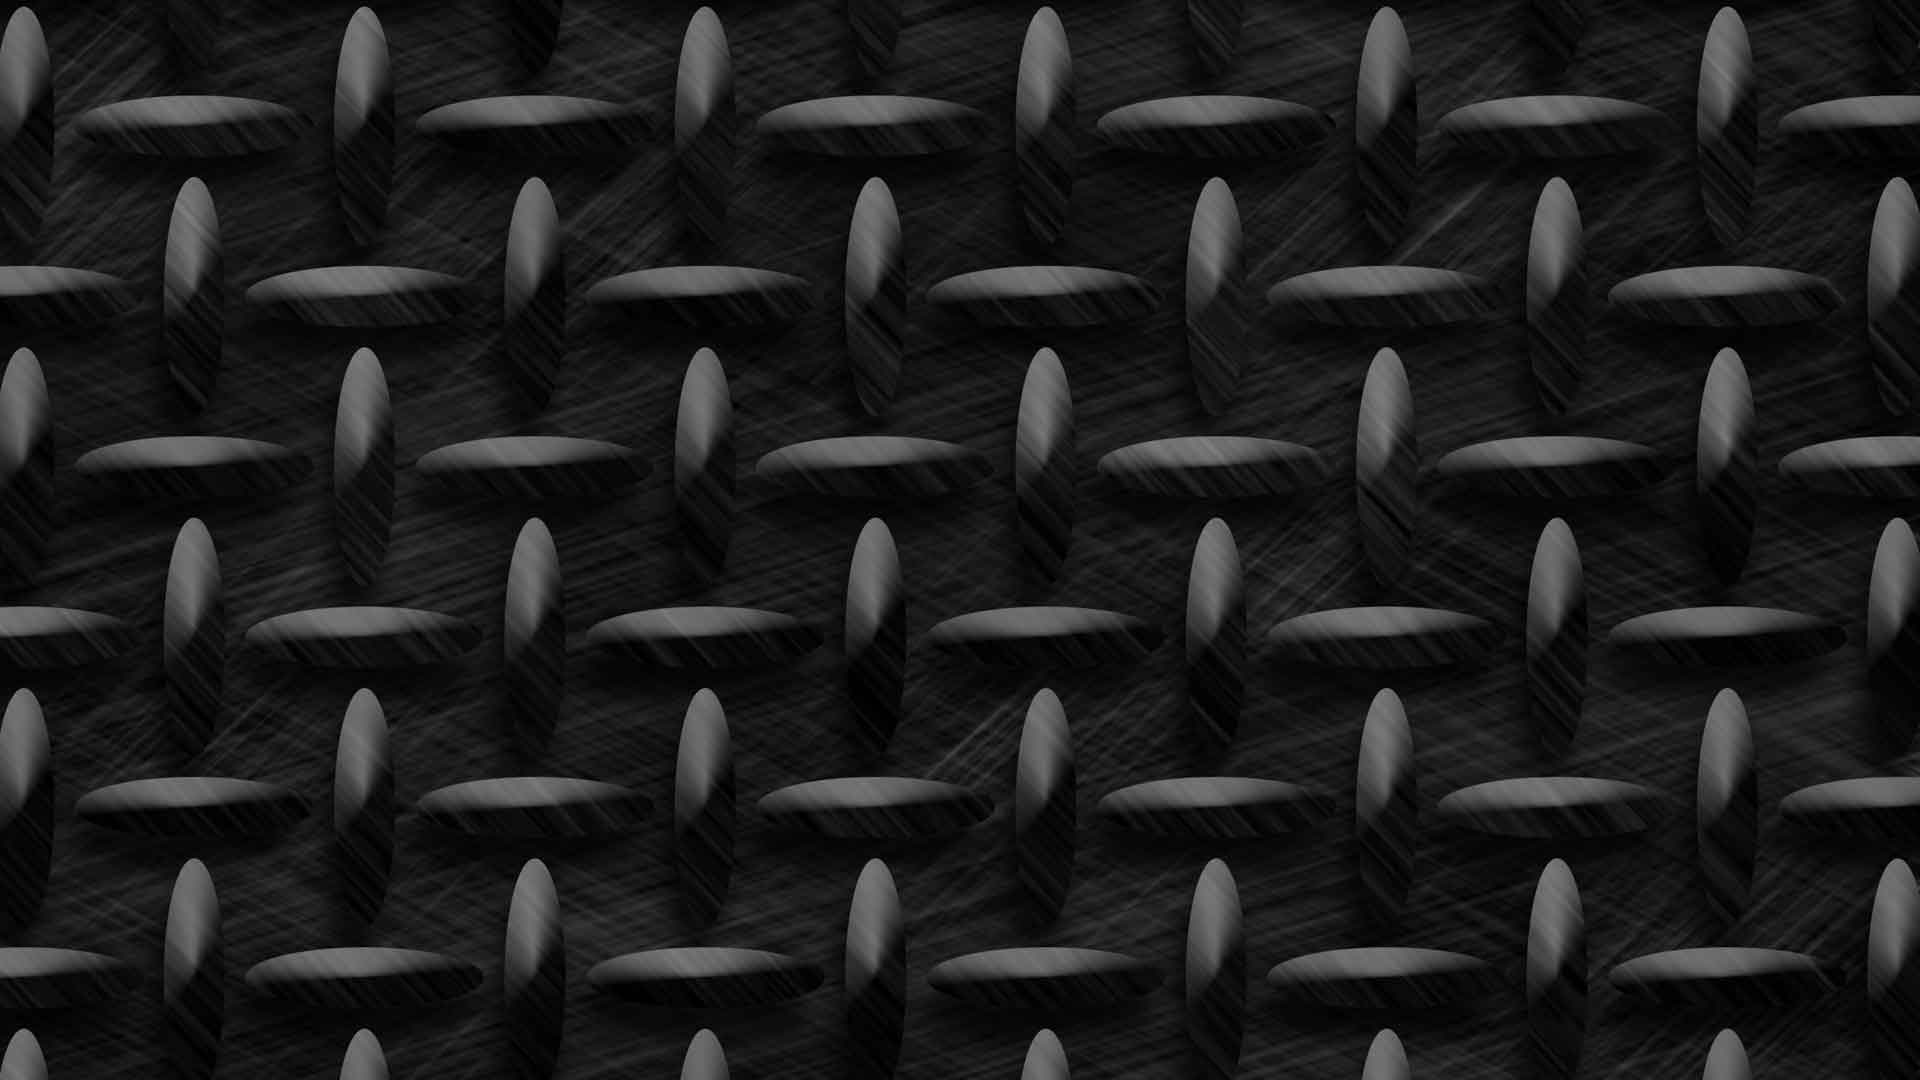 black hd wallpaper for laptop